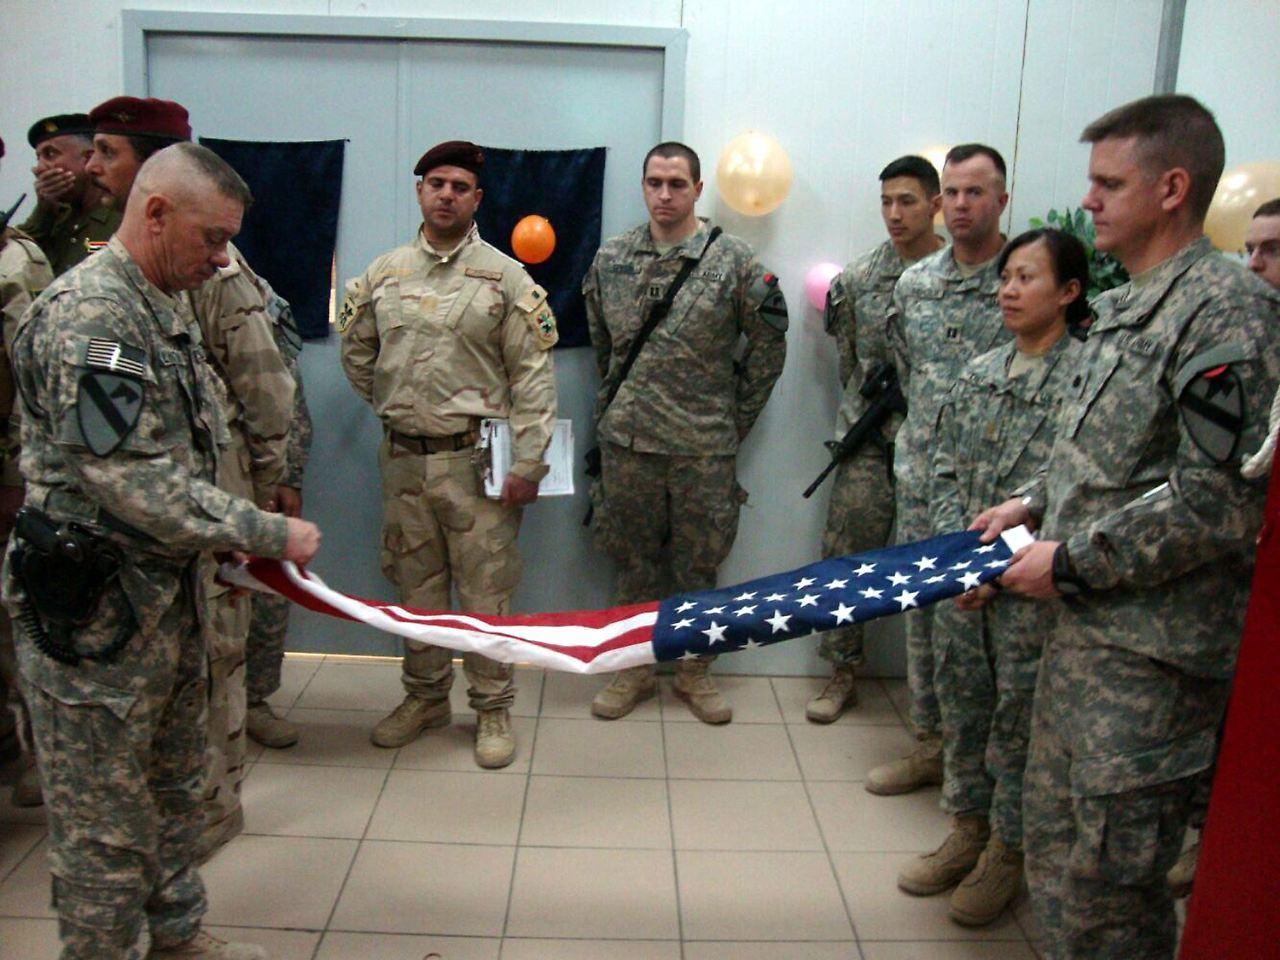 Iraker bald allein zu Haus: NATO zieht Soldaten ab - n-tv.de